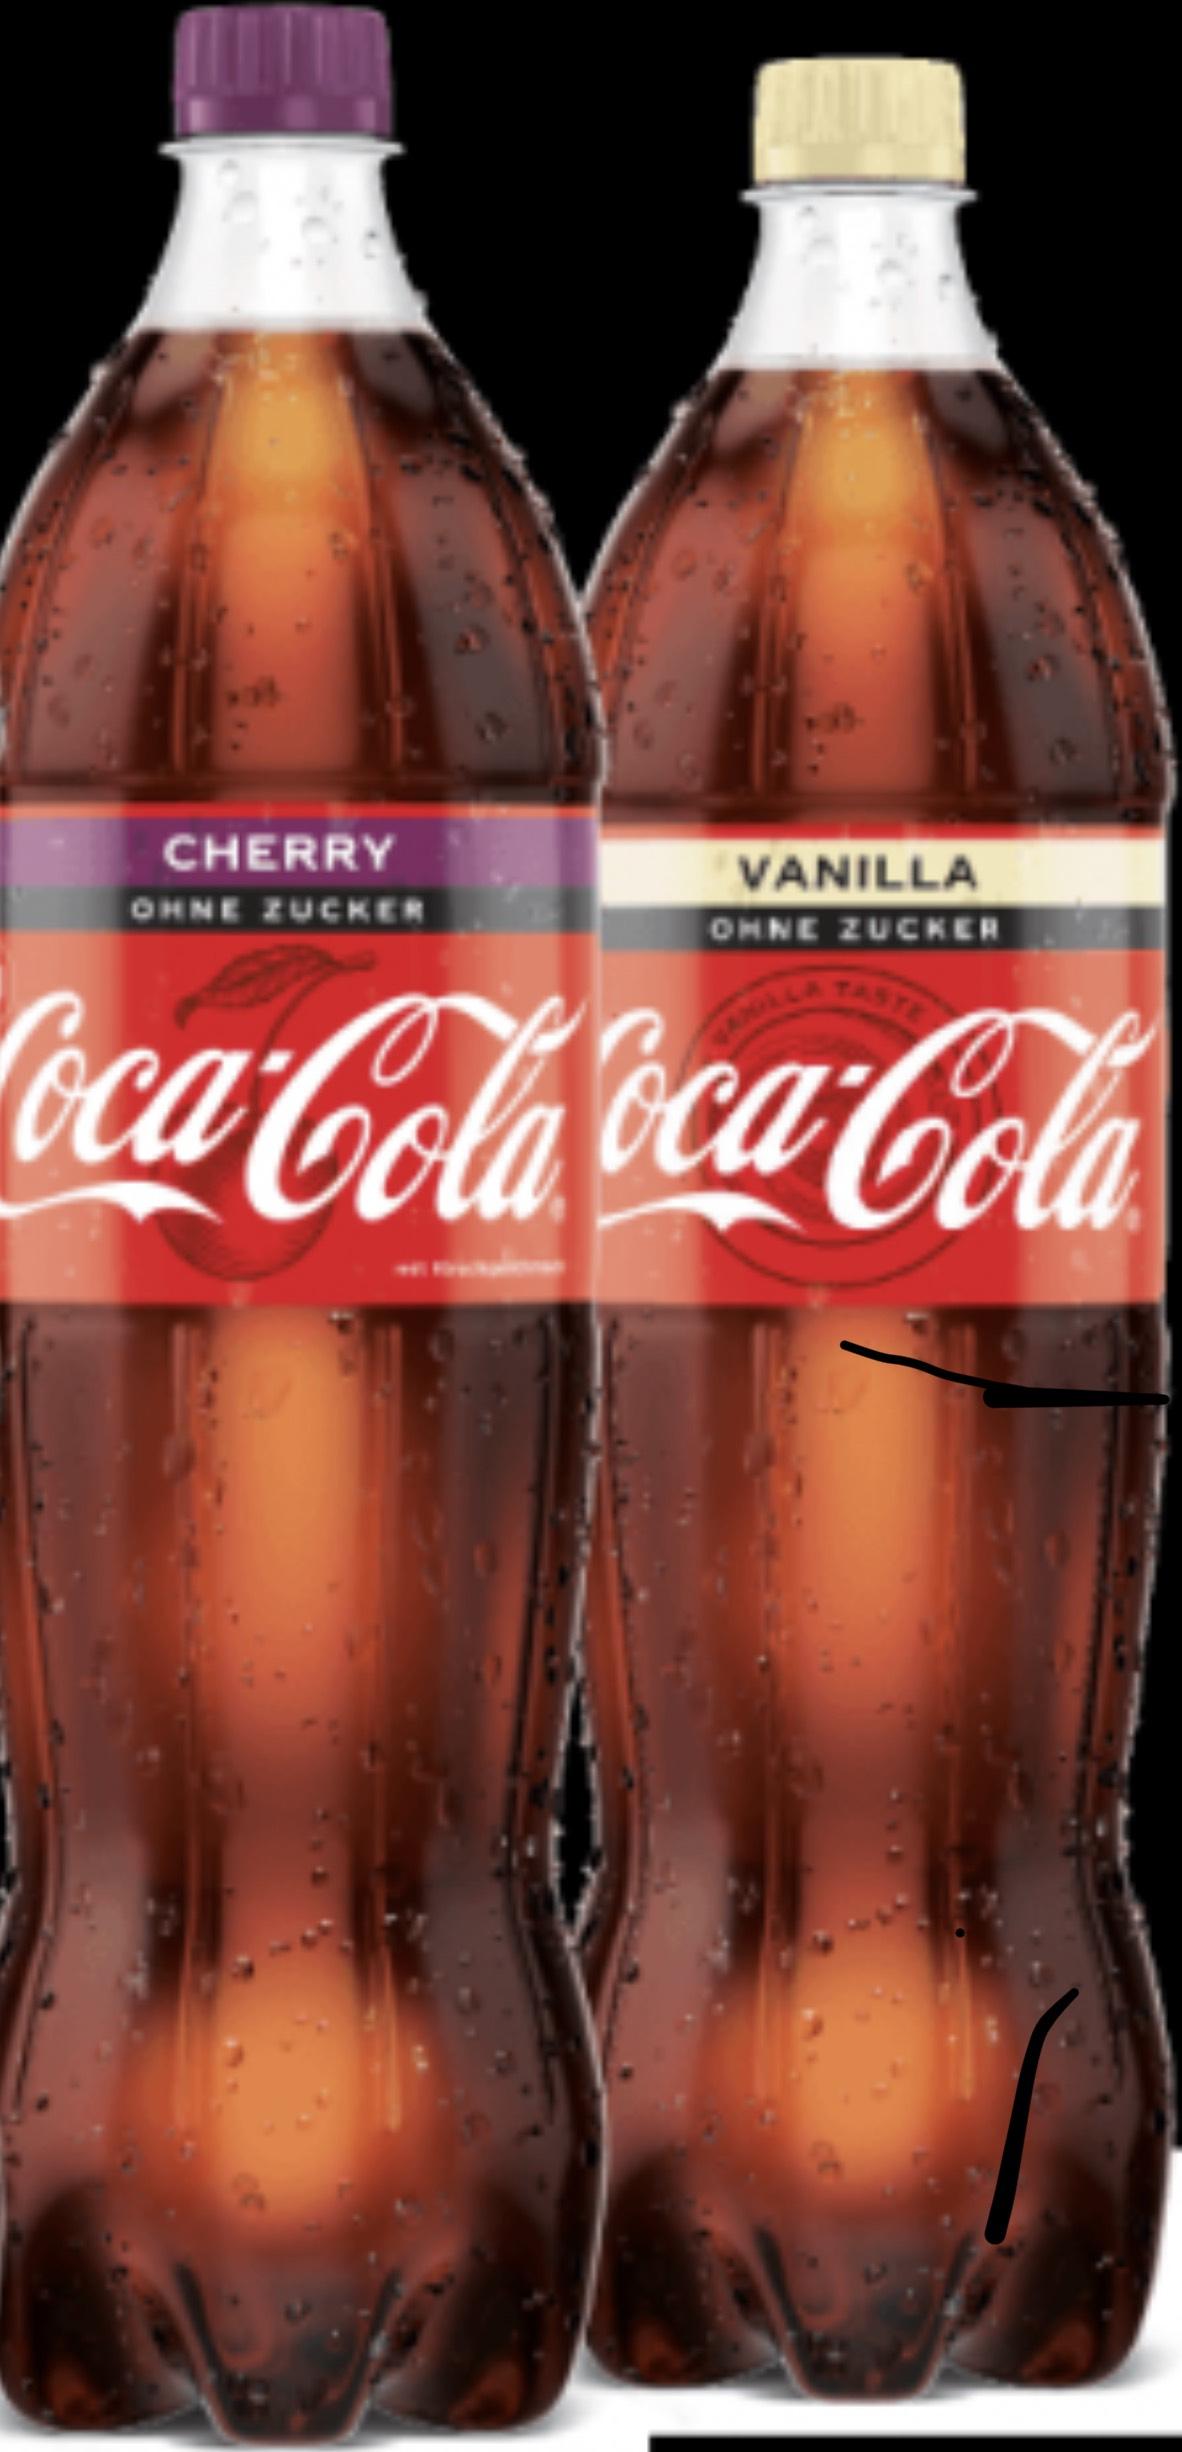 [Lokal] Jawoll Nienburg Coca Cola Zero Vanilla/Cherry 1,25 l PET